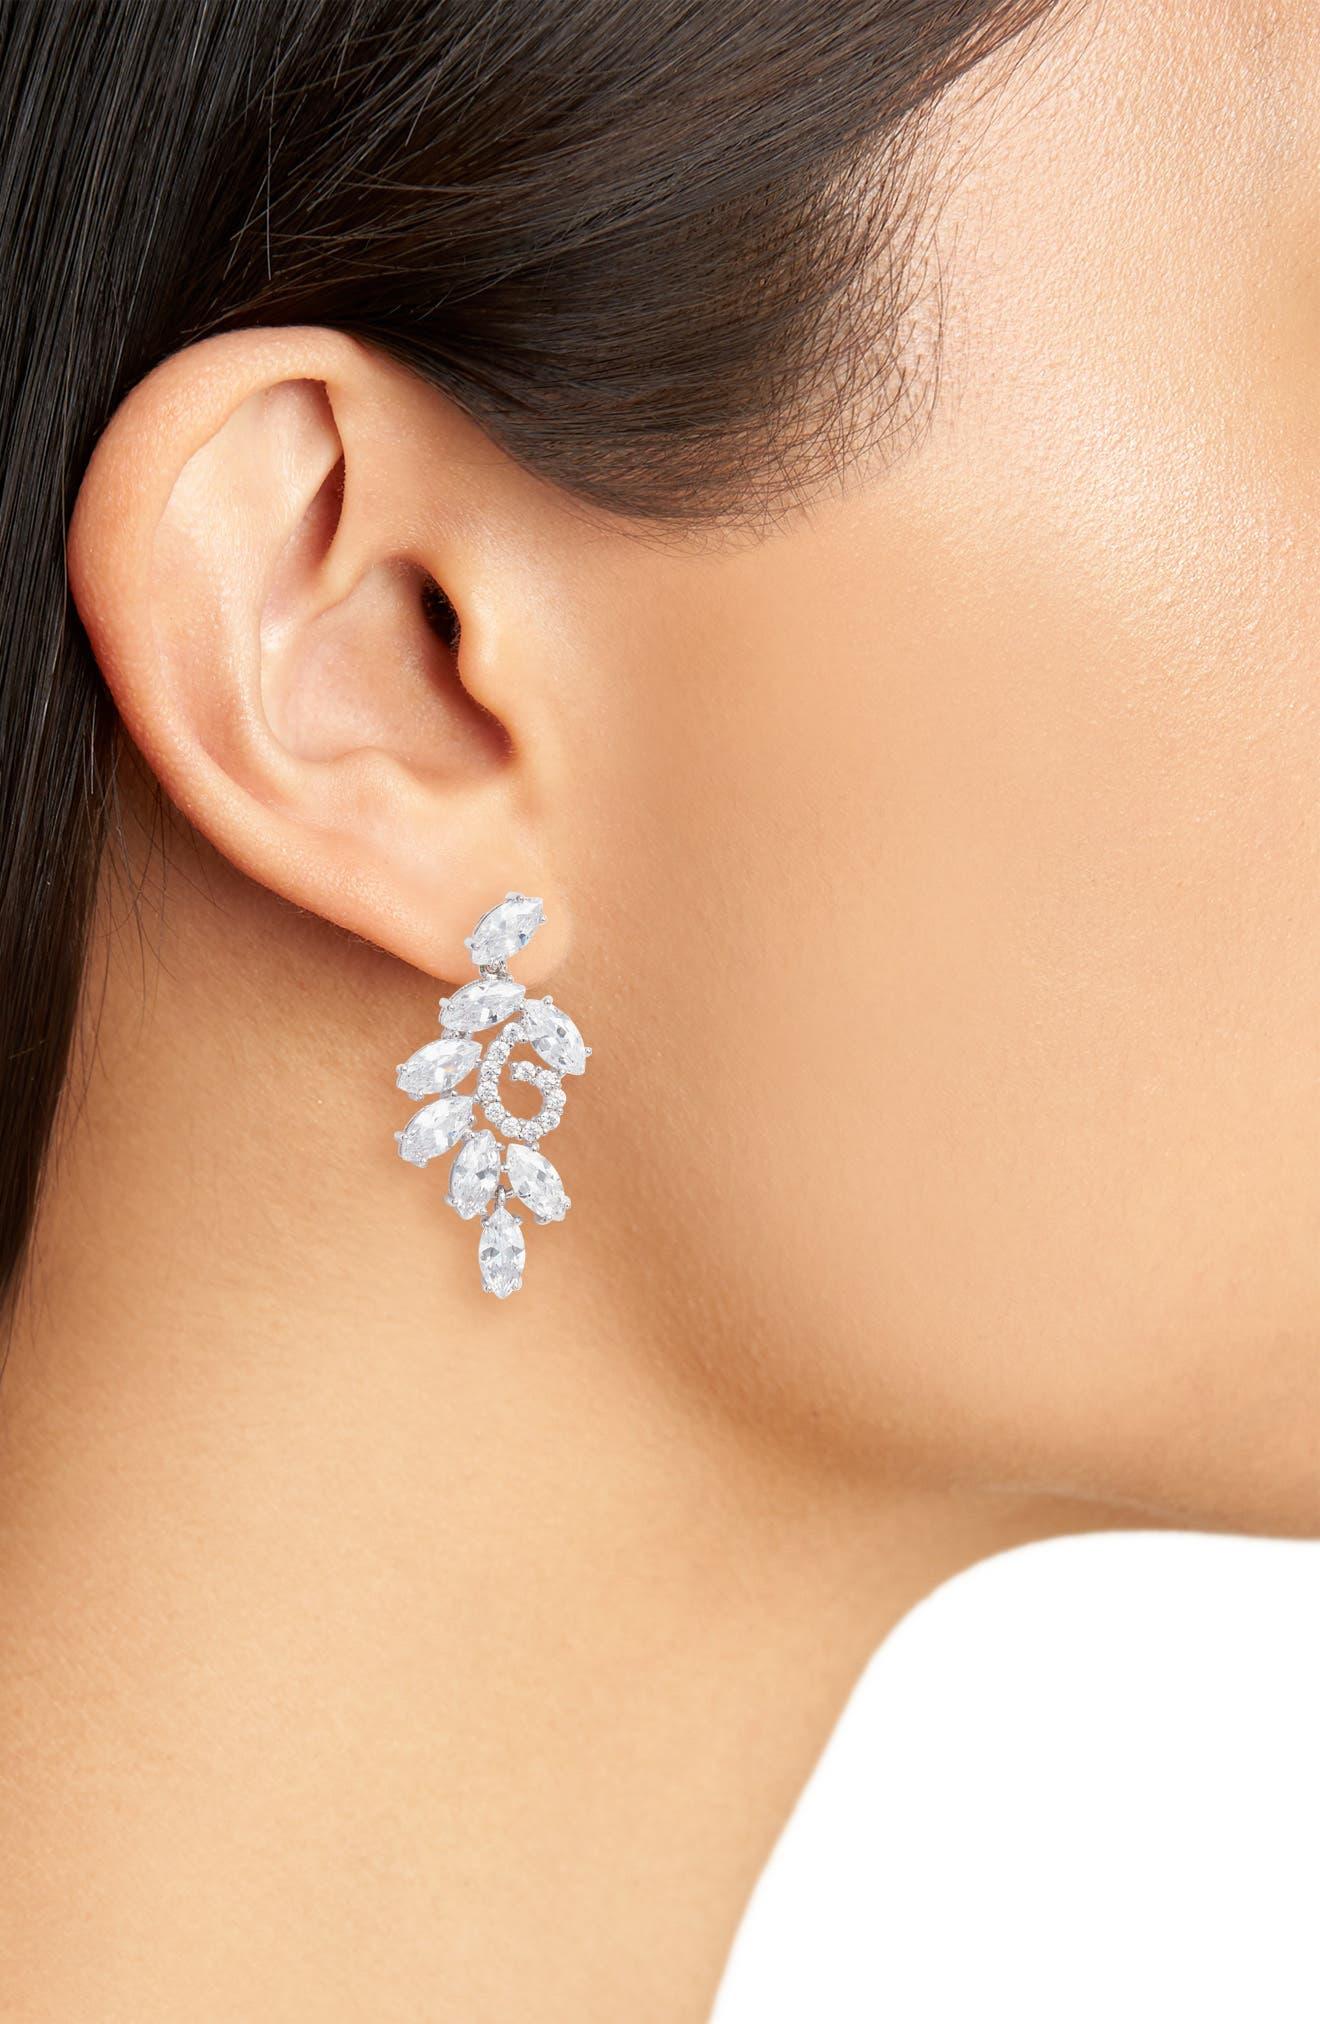 NINA, Cluster Branch Stud Earrings, Alternate thumbnail 2, color, SILVER/ WHITE CZ